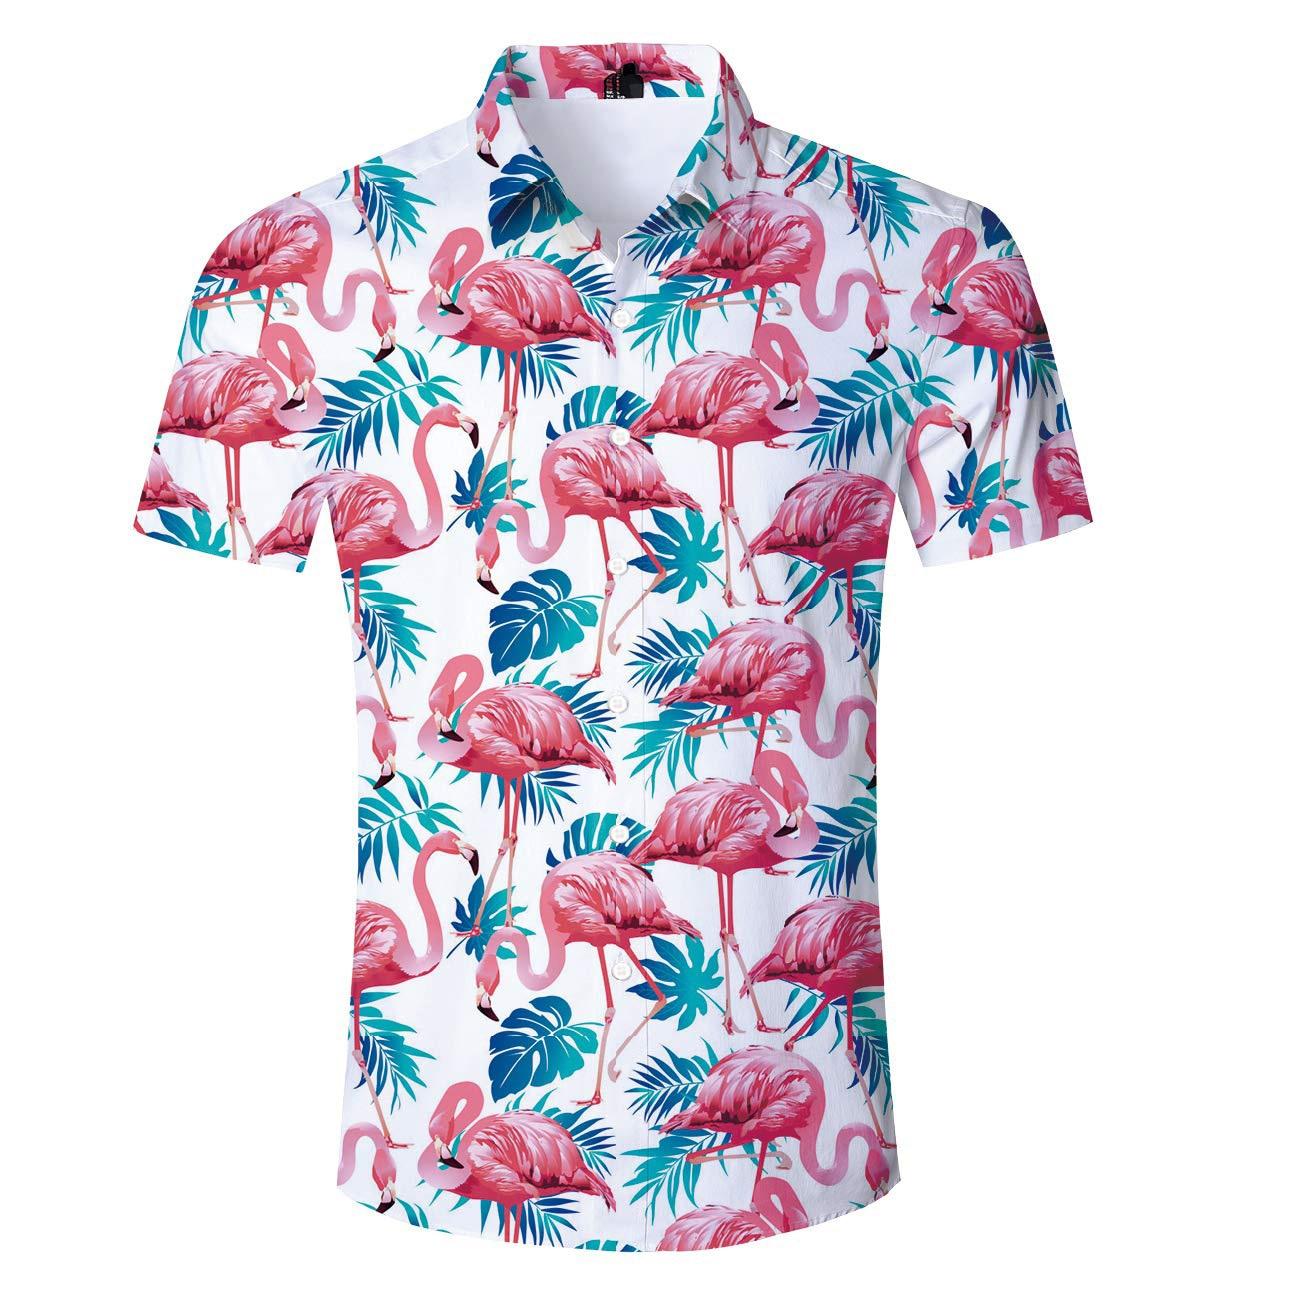 US SIZE 2019 New Summer Tropical Leaves Flamingo Print Beach Shirt Hawaiian Vacation Blouse